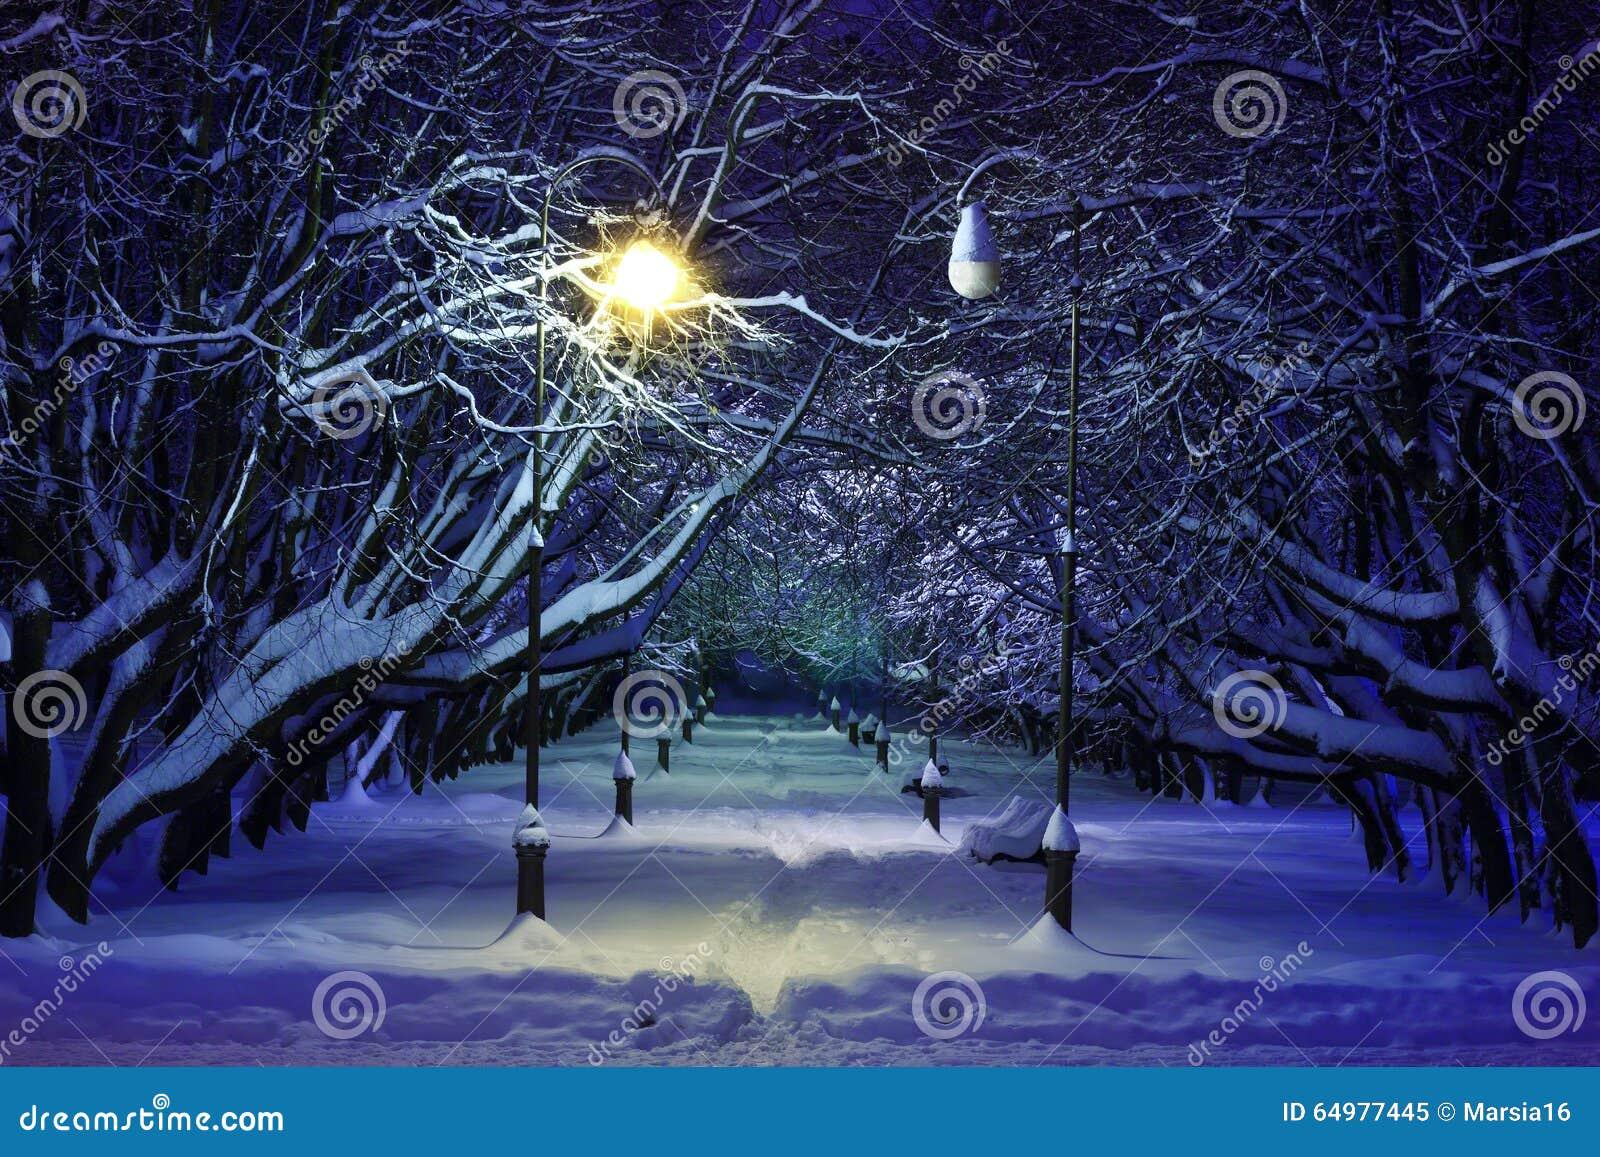 Winter park night scene